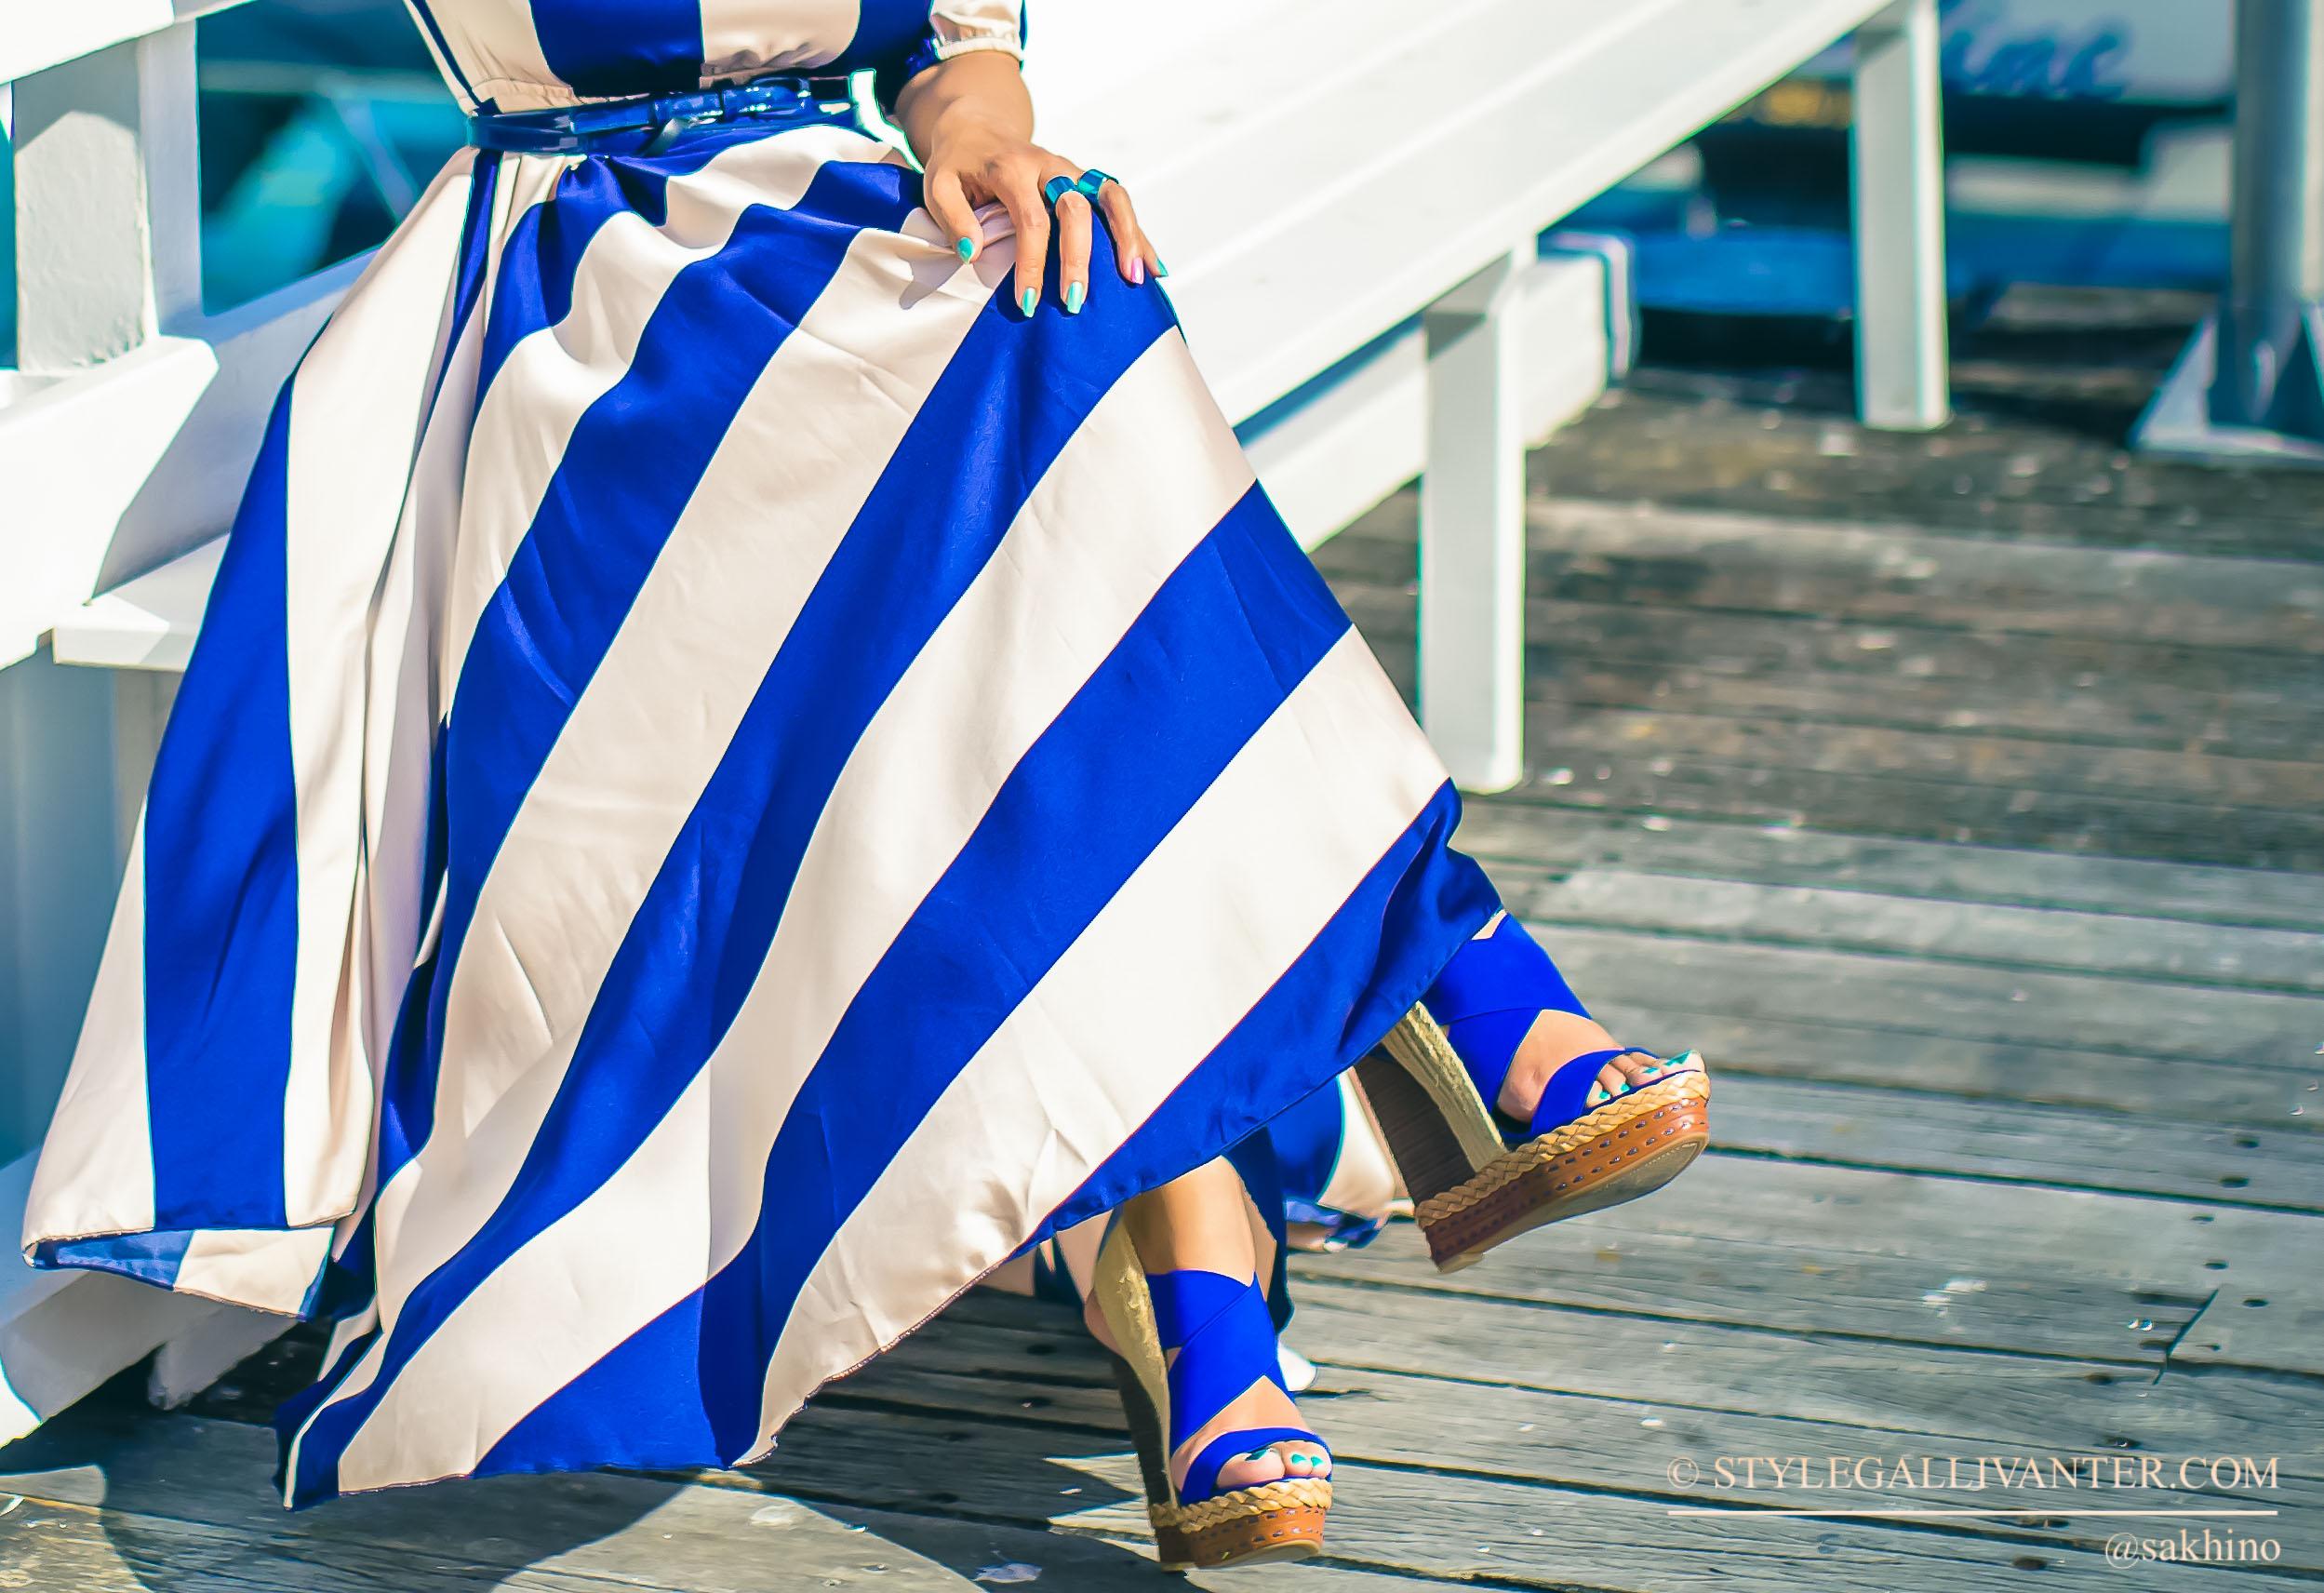 HAMILTON-ISLAND_TOP-AUSTRALIAN-DESTINATIONS_STYLEGALLIVANTER_MIRANDA-SAKHINO_sakhino_magazine-cover-december-2015_summer-2015-editorials_australia's-top-fashion-bloggers-10